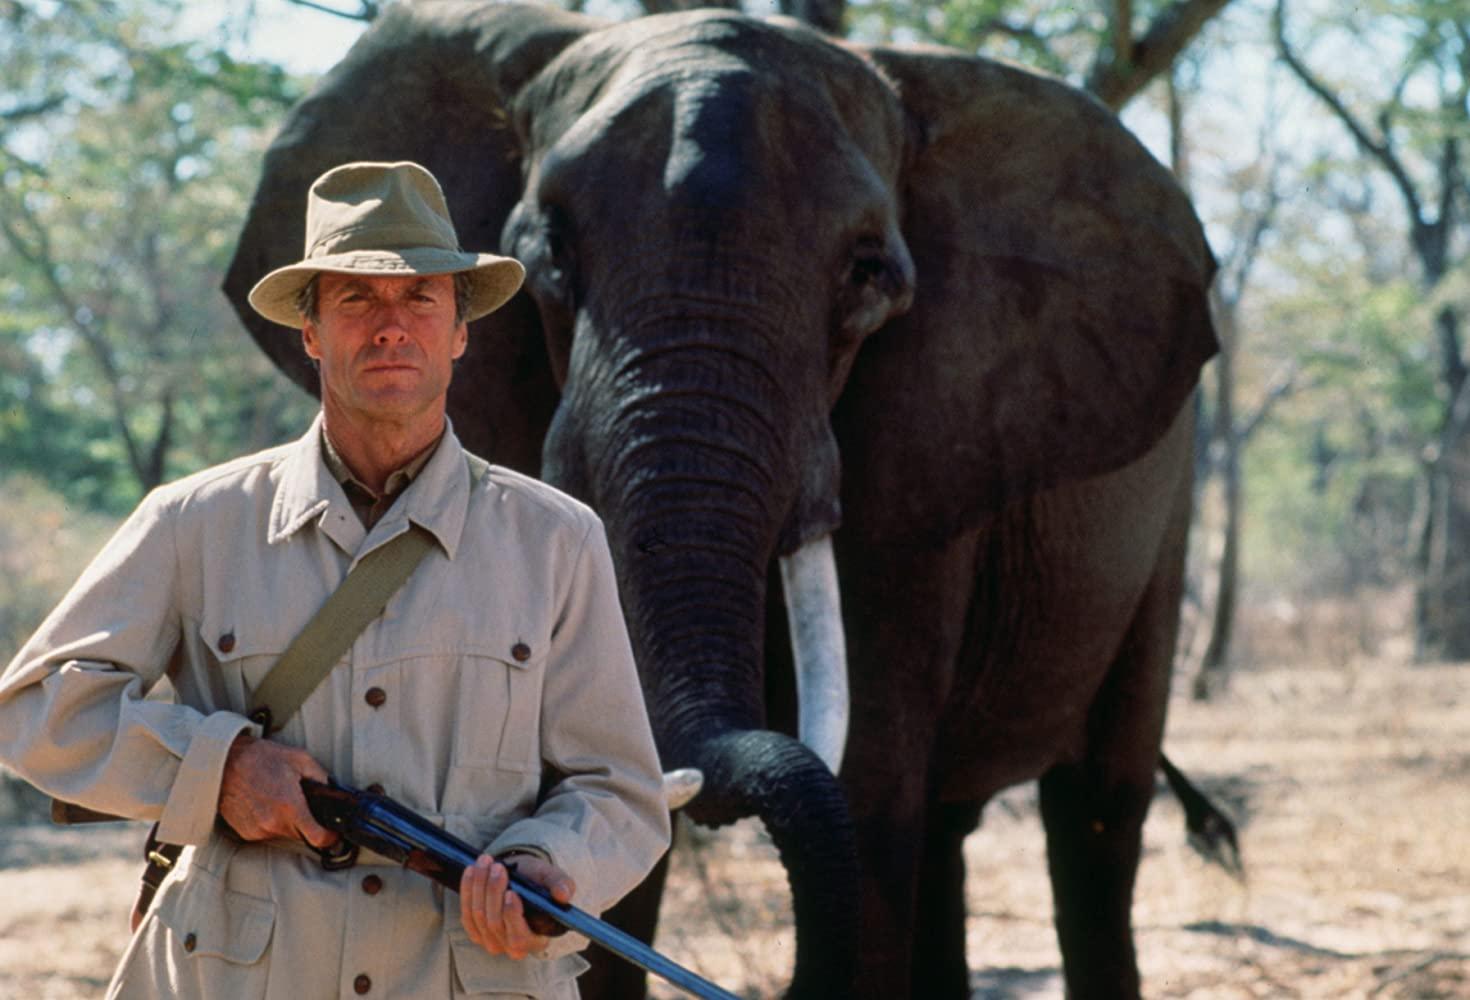 Clint Eastwood, los inicios del ultimo mito - Página 5 MV5BMTA0MDc3OTcyNDBeQTJeQWpwZ15BbWU4MDgwMzQ2NzEx._V1_SY1000_CR0%252C0%252C1470%252C1000_AL_